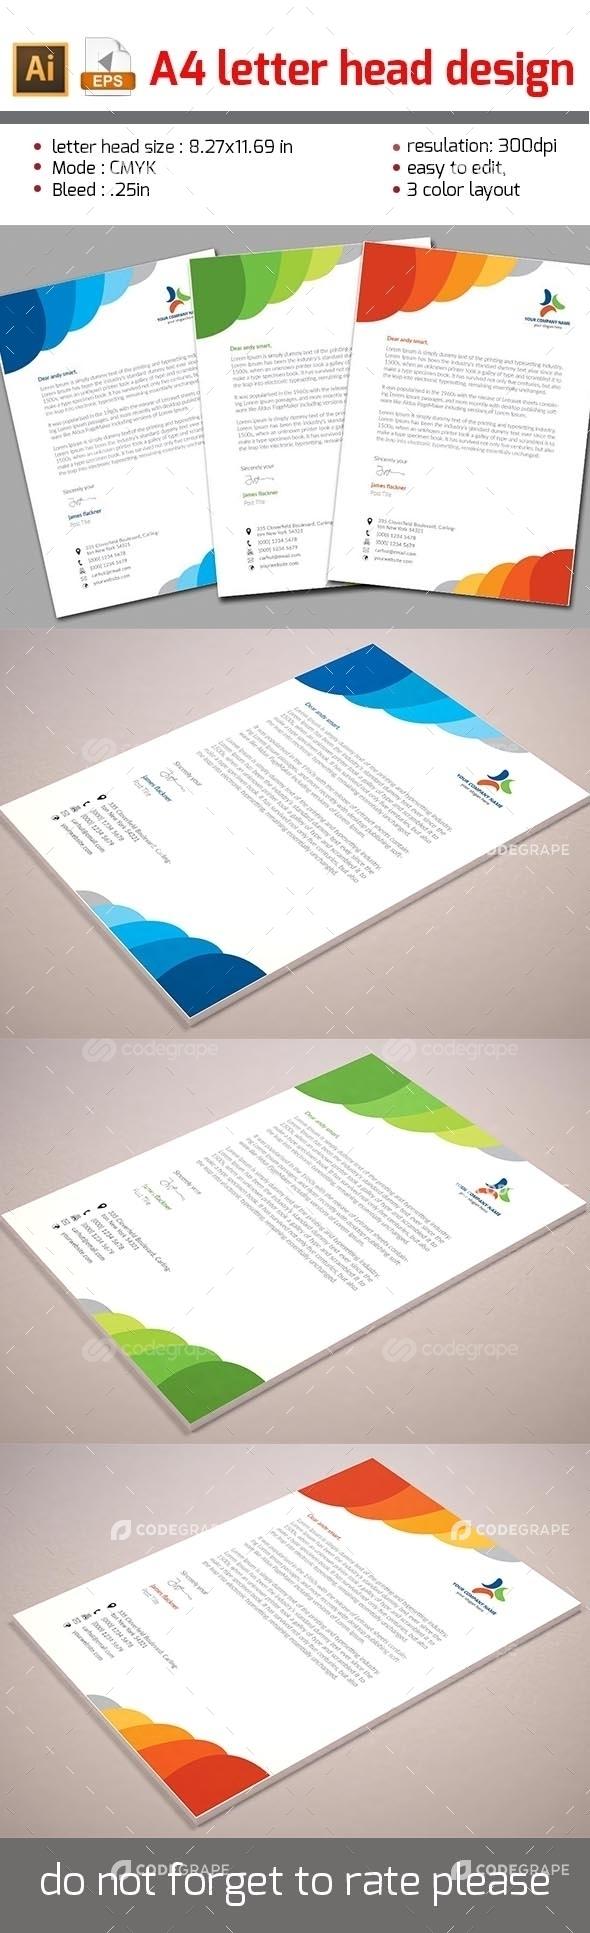 Letter Head Design A4